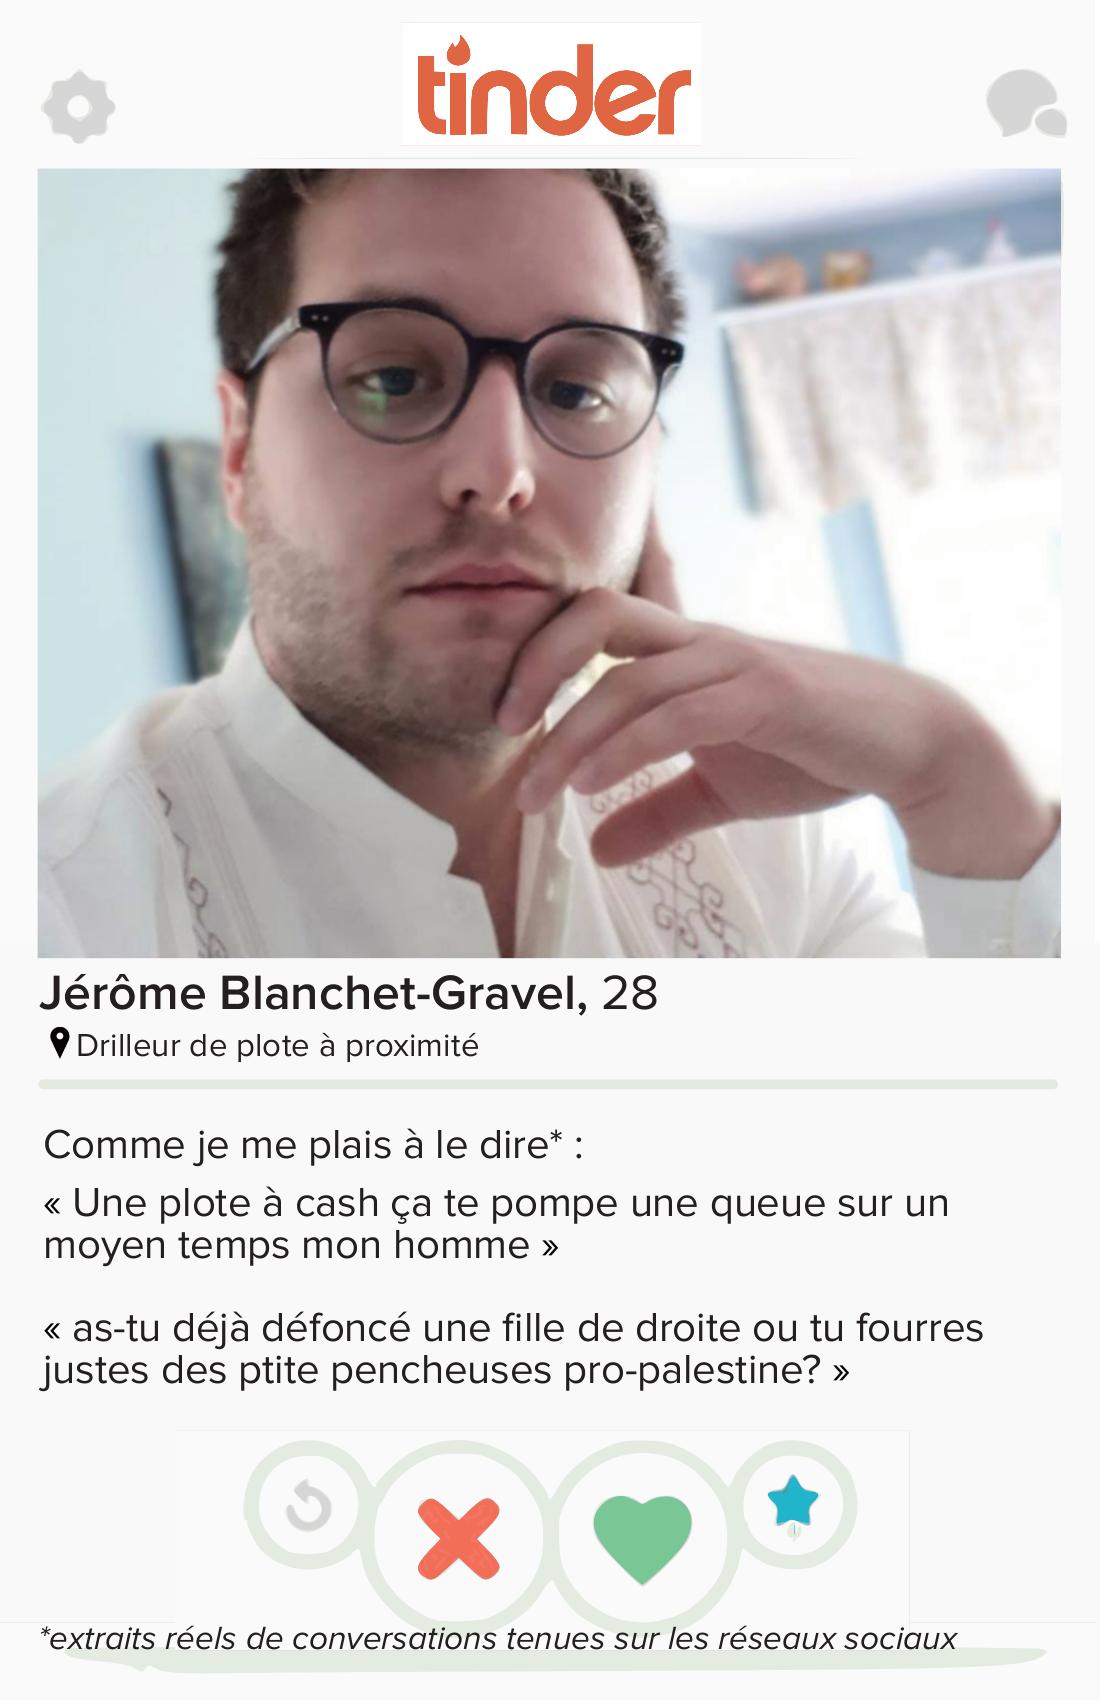 Postering against Jérôme Blanchet-Gravel